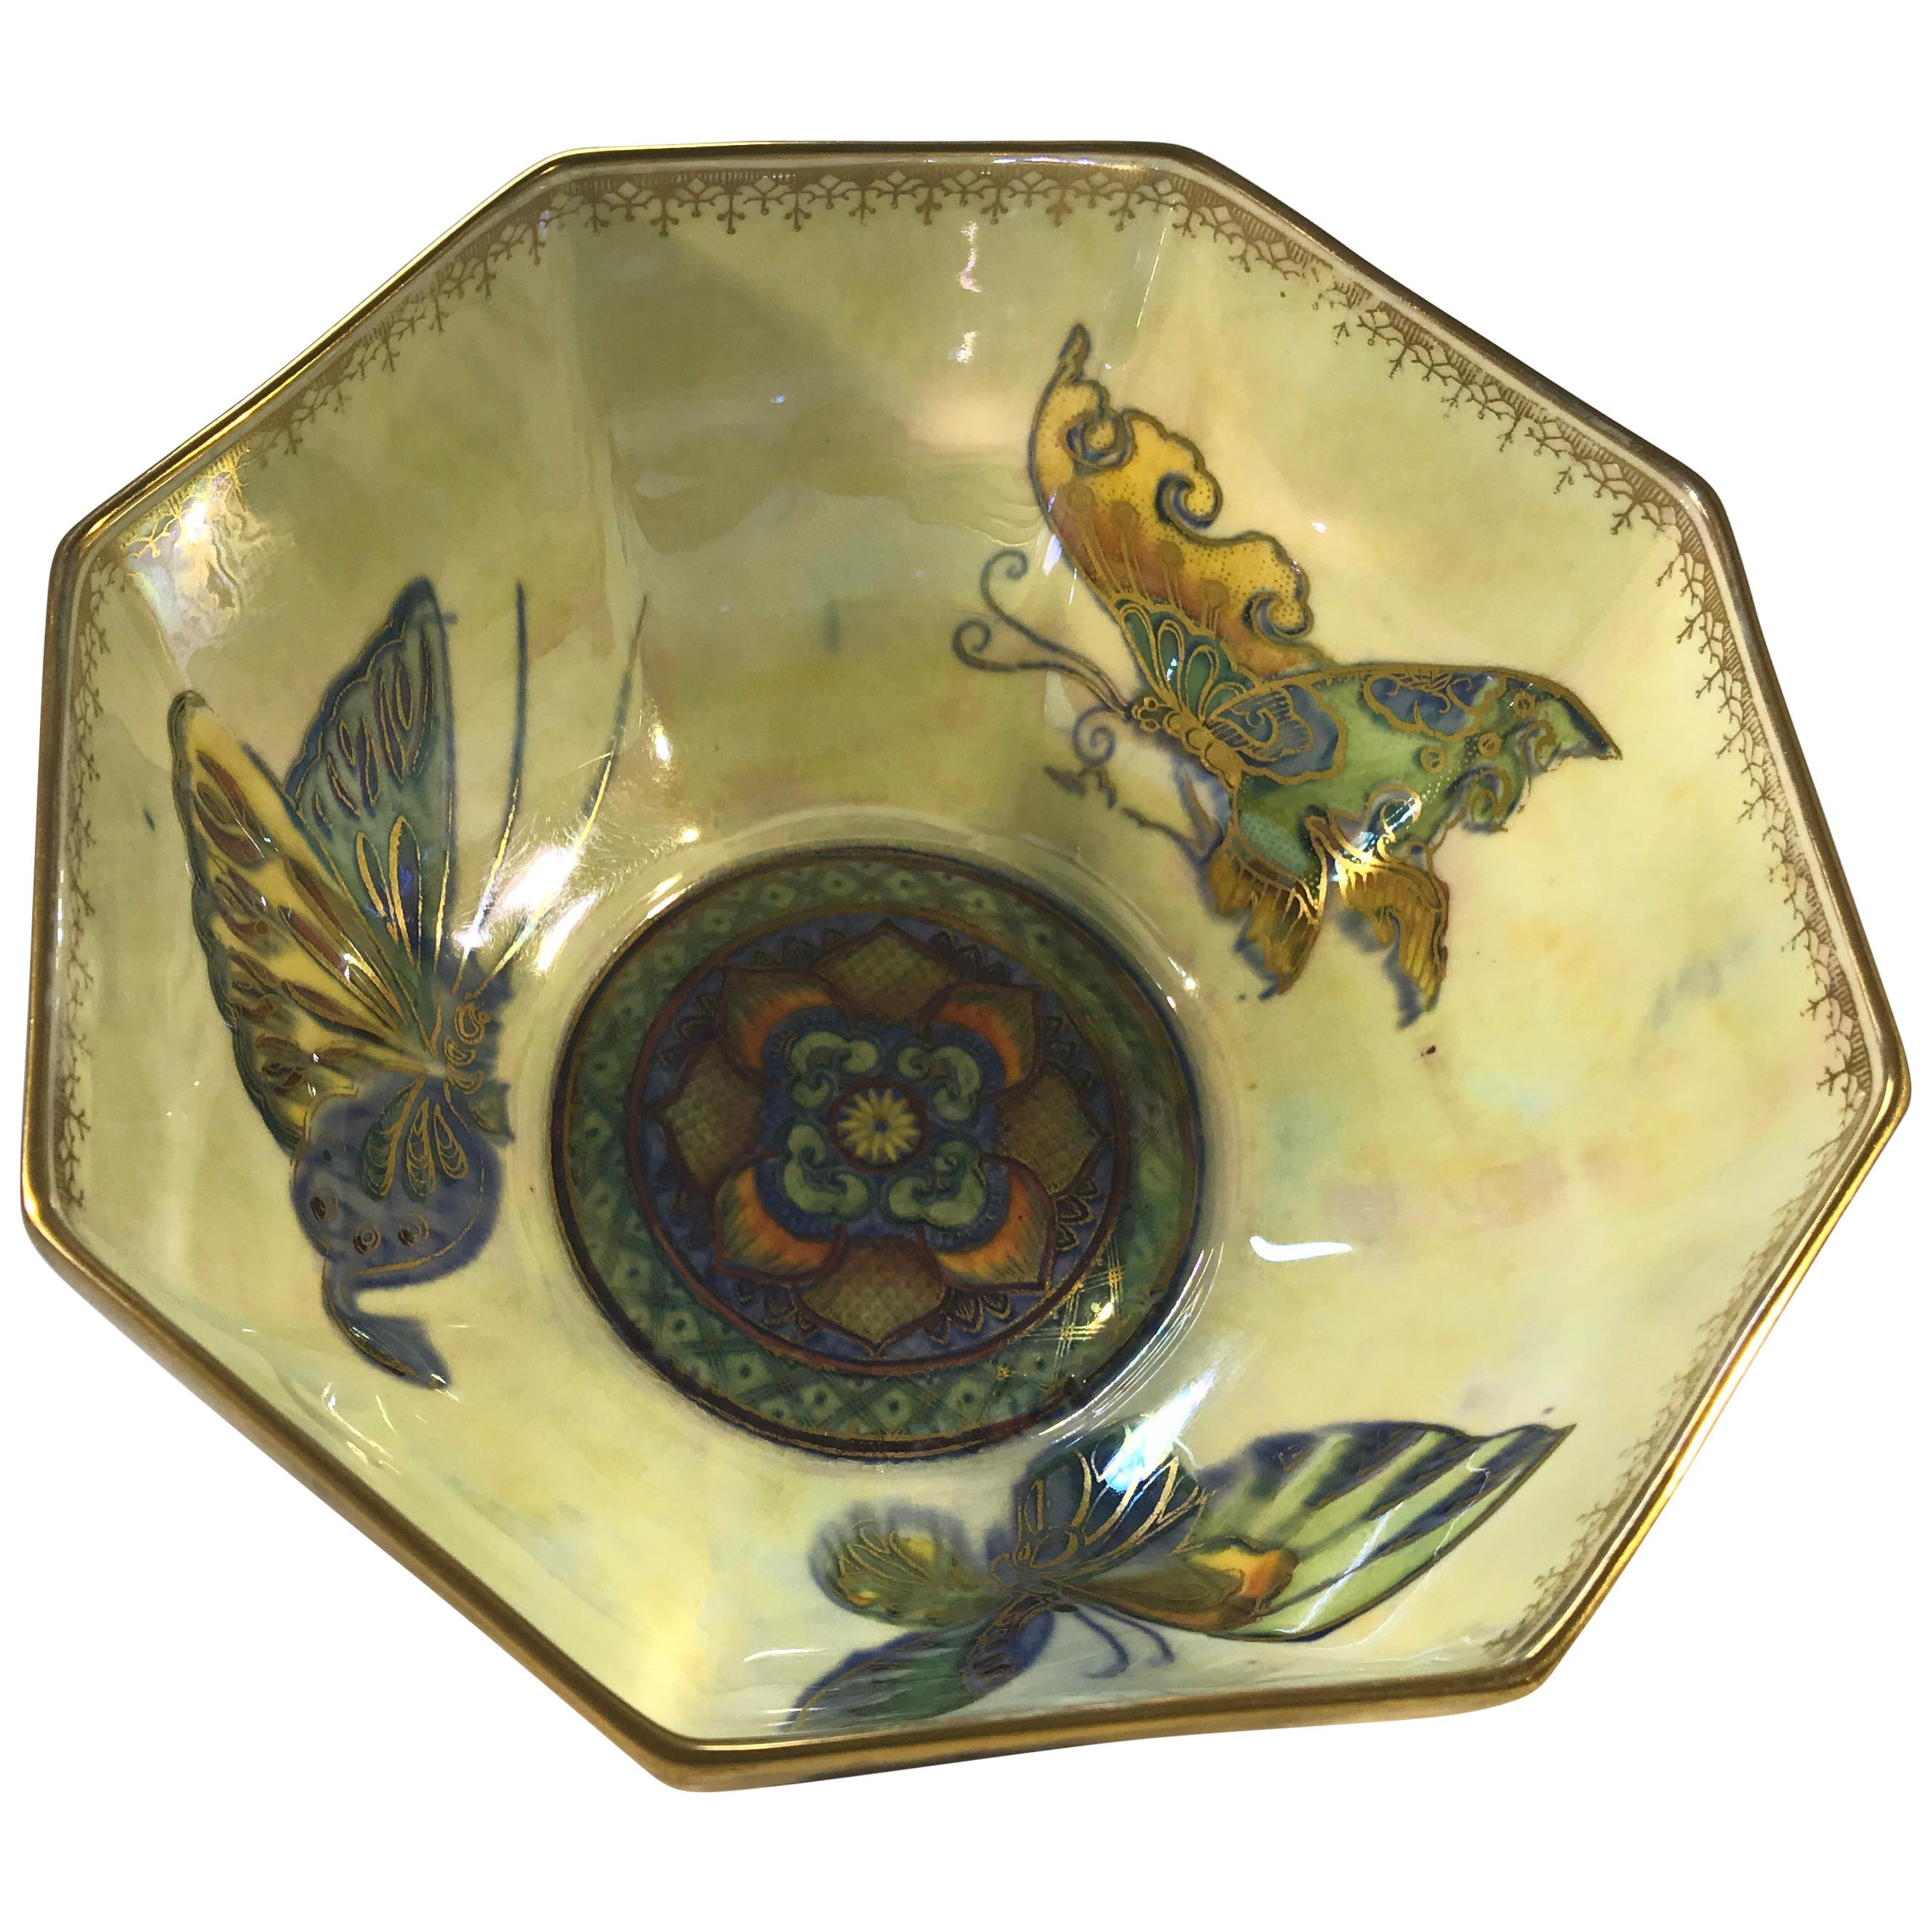 Fairyland Lustre Butterfly Octagonal Bowl Daisy Makeig-Jones Wedgwood Deco, 1925